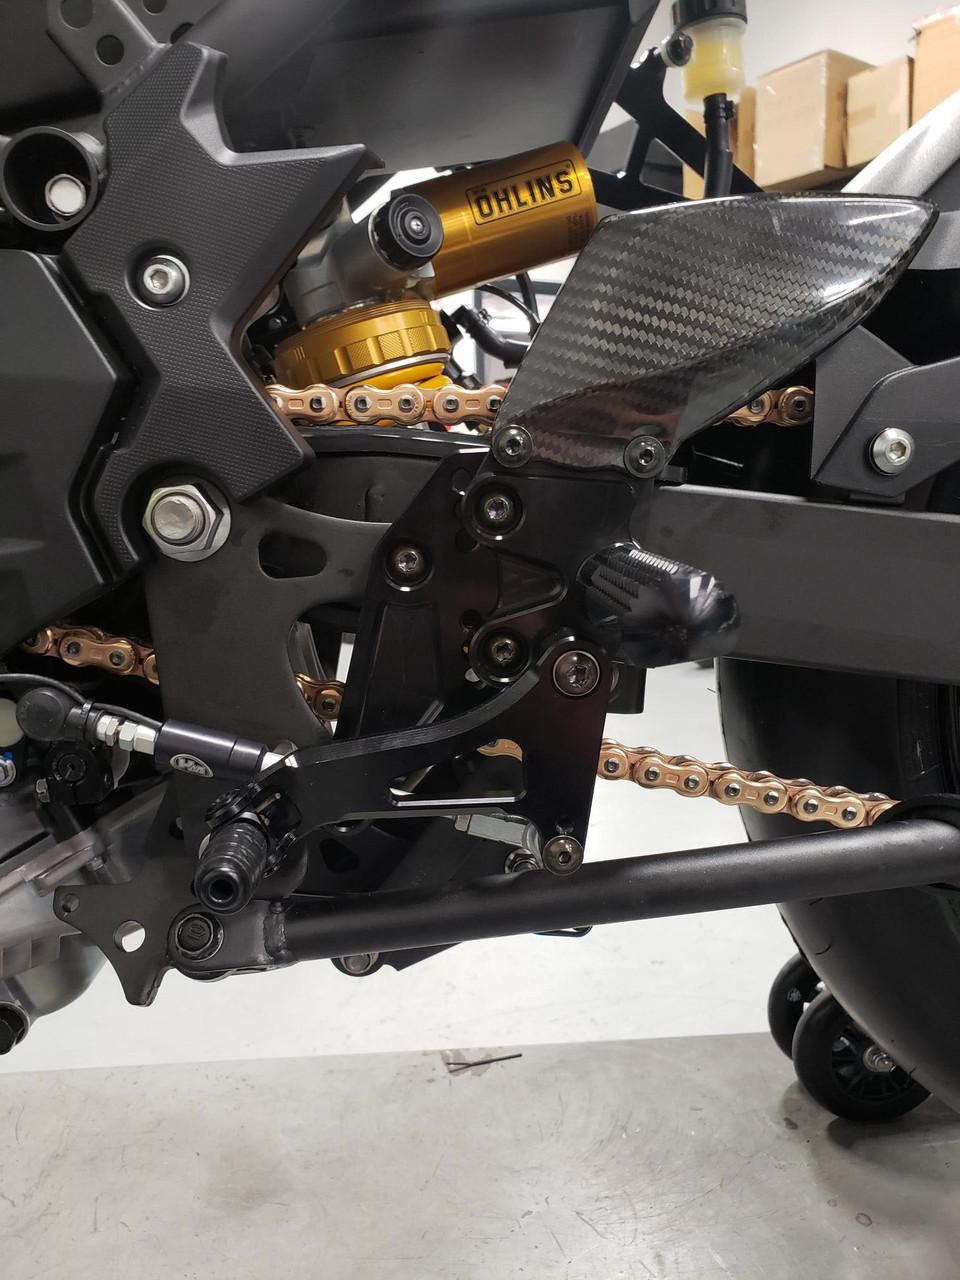 Kawasaki Ninja EX400 Full Stainless Exhaust Titanium Silencer